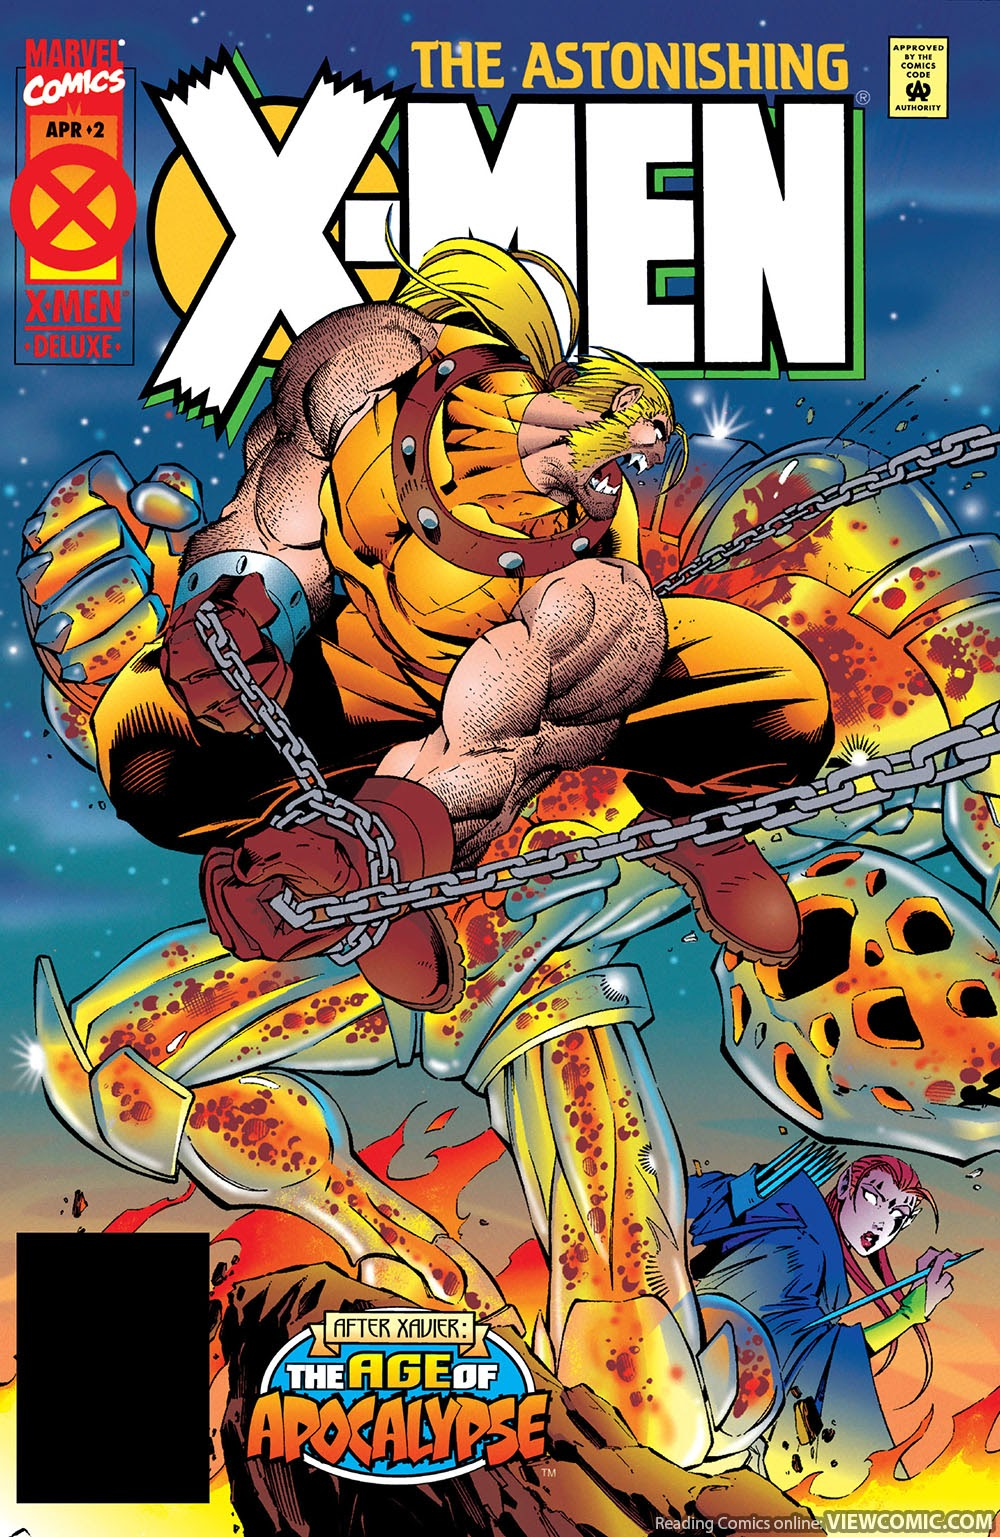 Astonishing X-Men | Viewcomic reading comics online for free